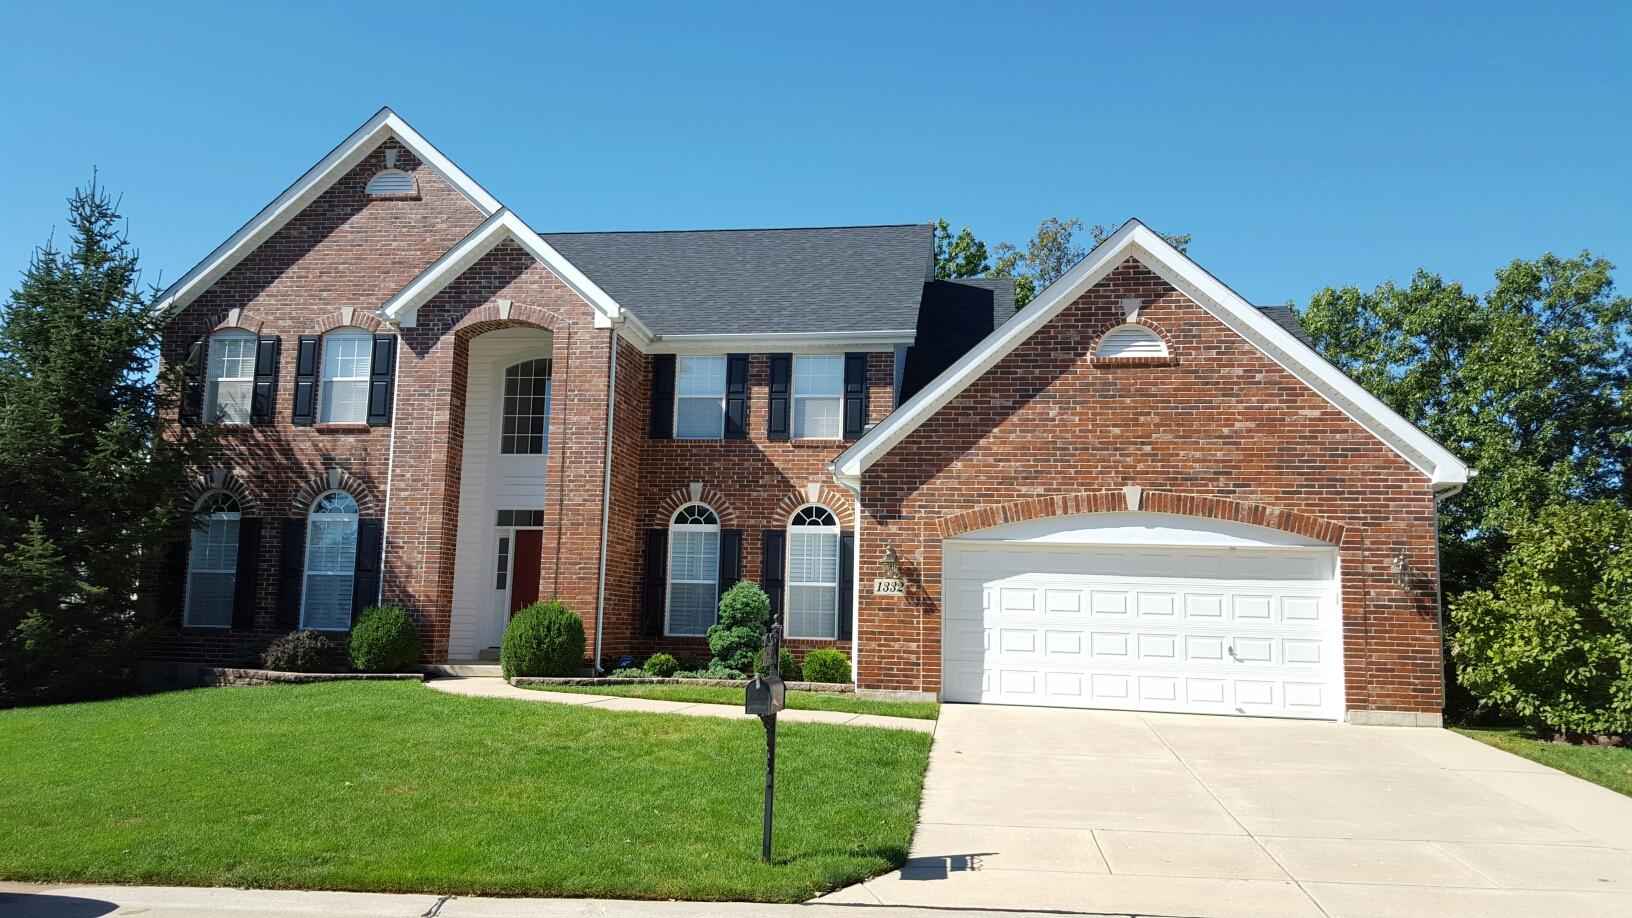 Ballwin, MO - New roof in Ellisville. Call Joe 314-550-7369